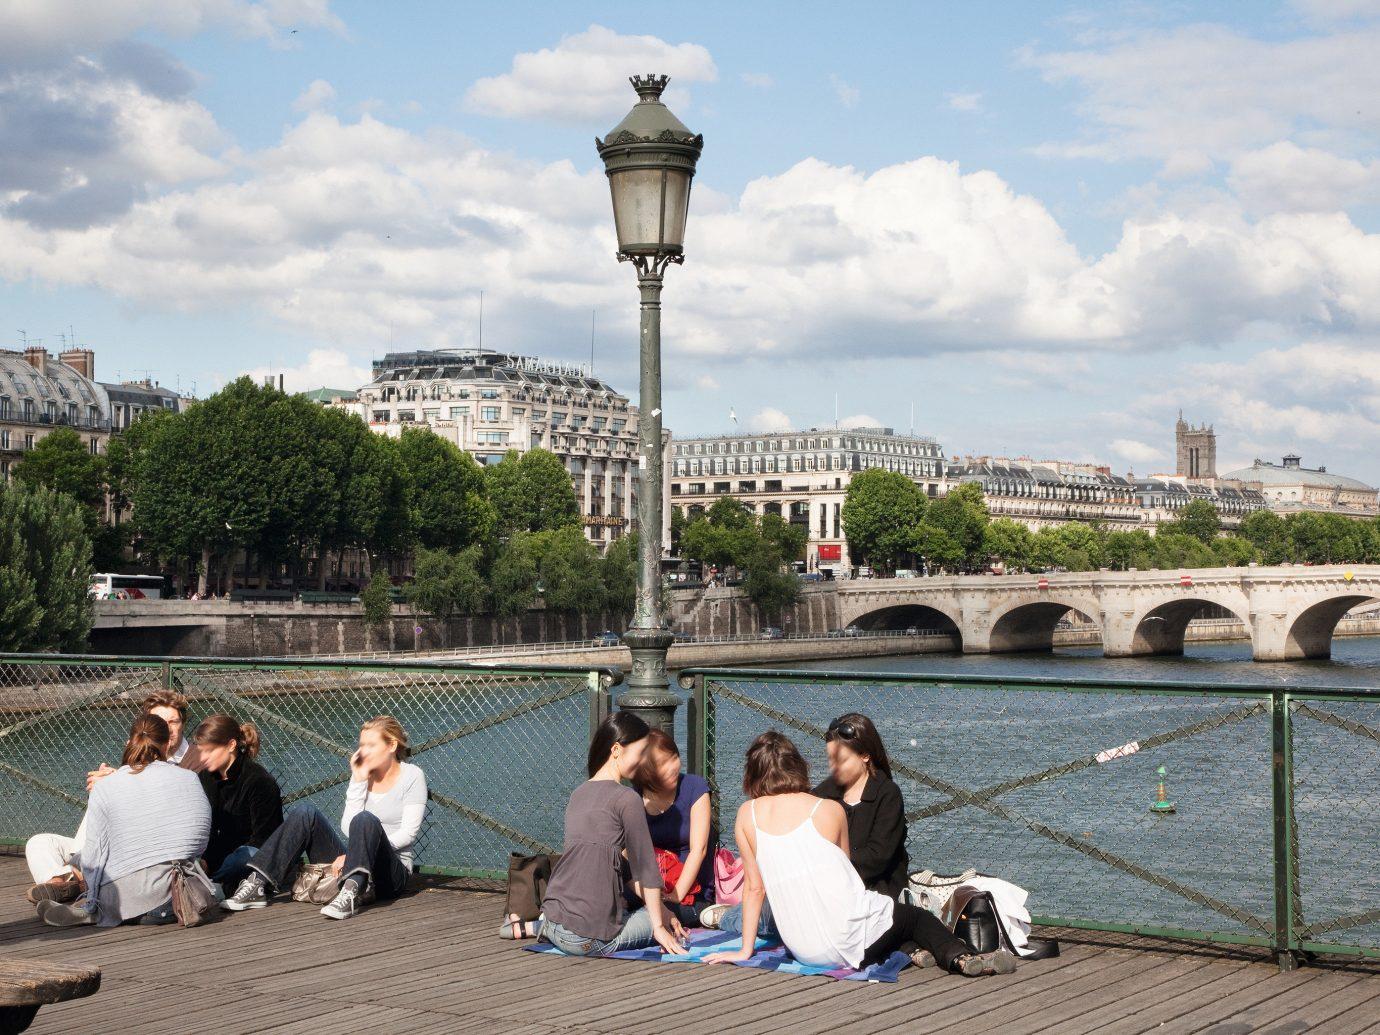 Romance Trip Ideas sky outdoor landmark people vacation tourism group tower